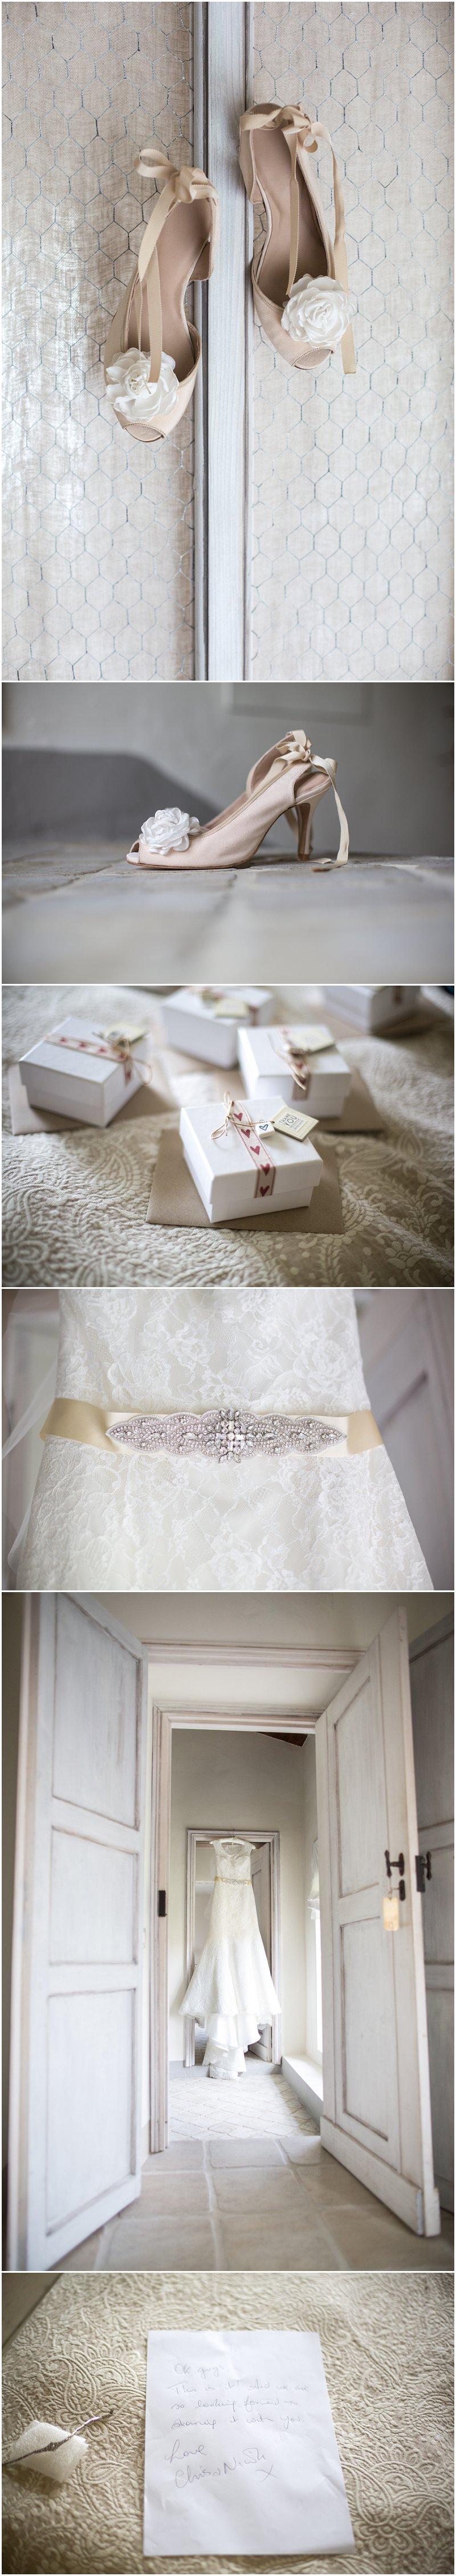 Detail shots during bridal prep La Villa, Italy